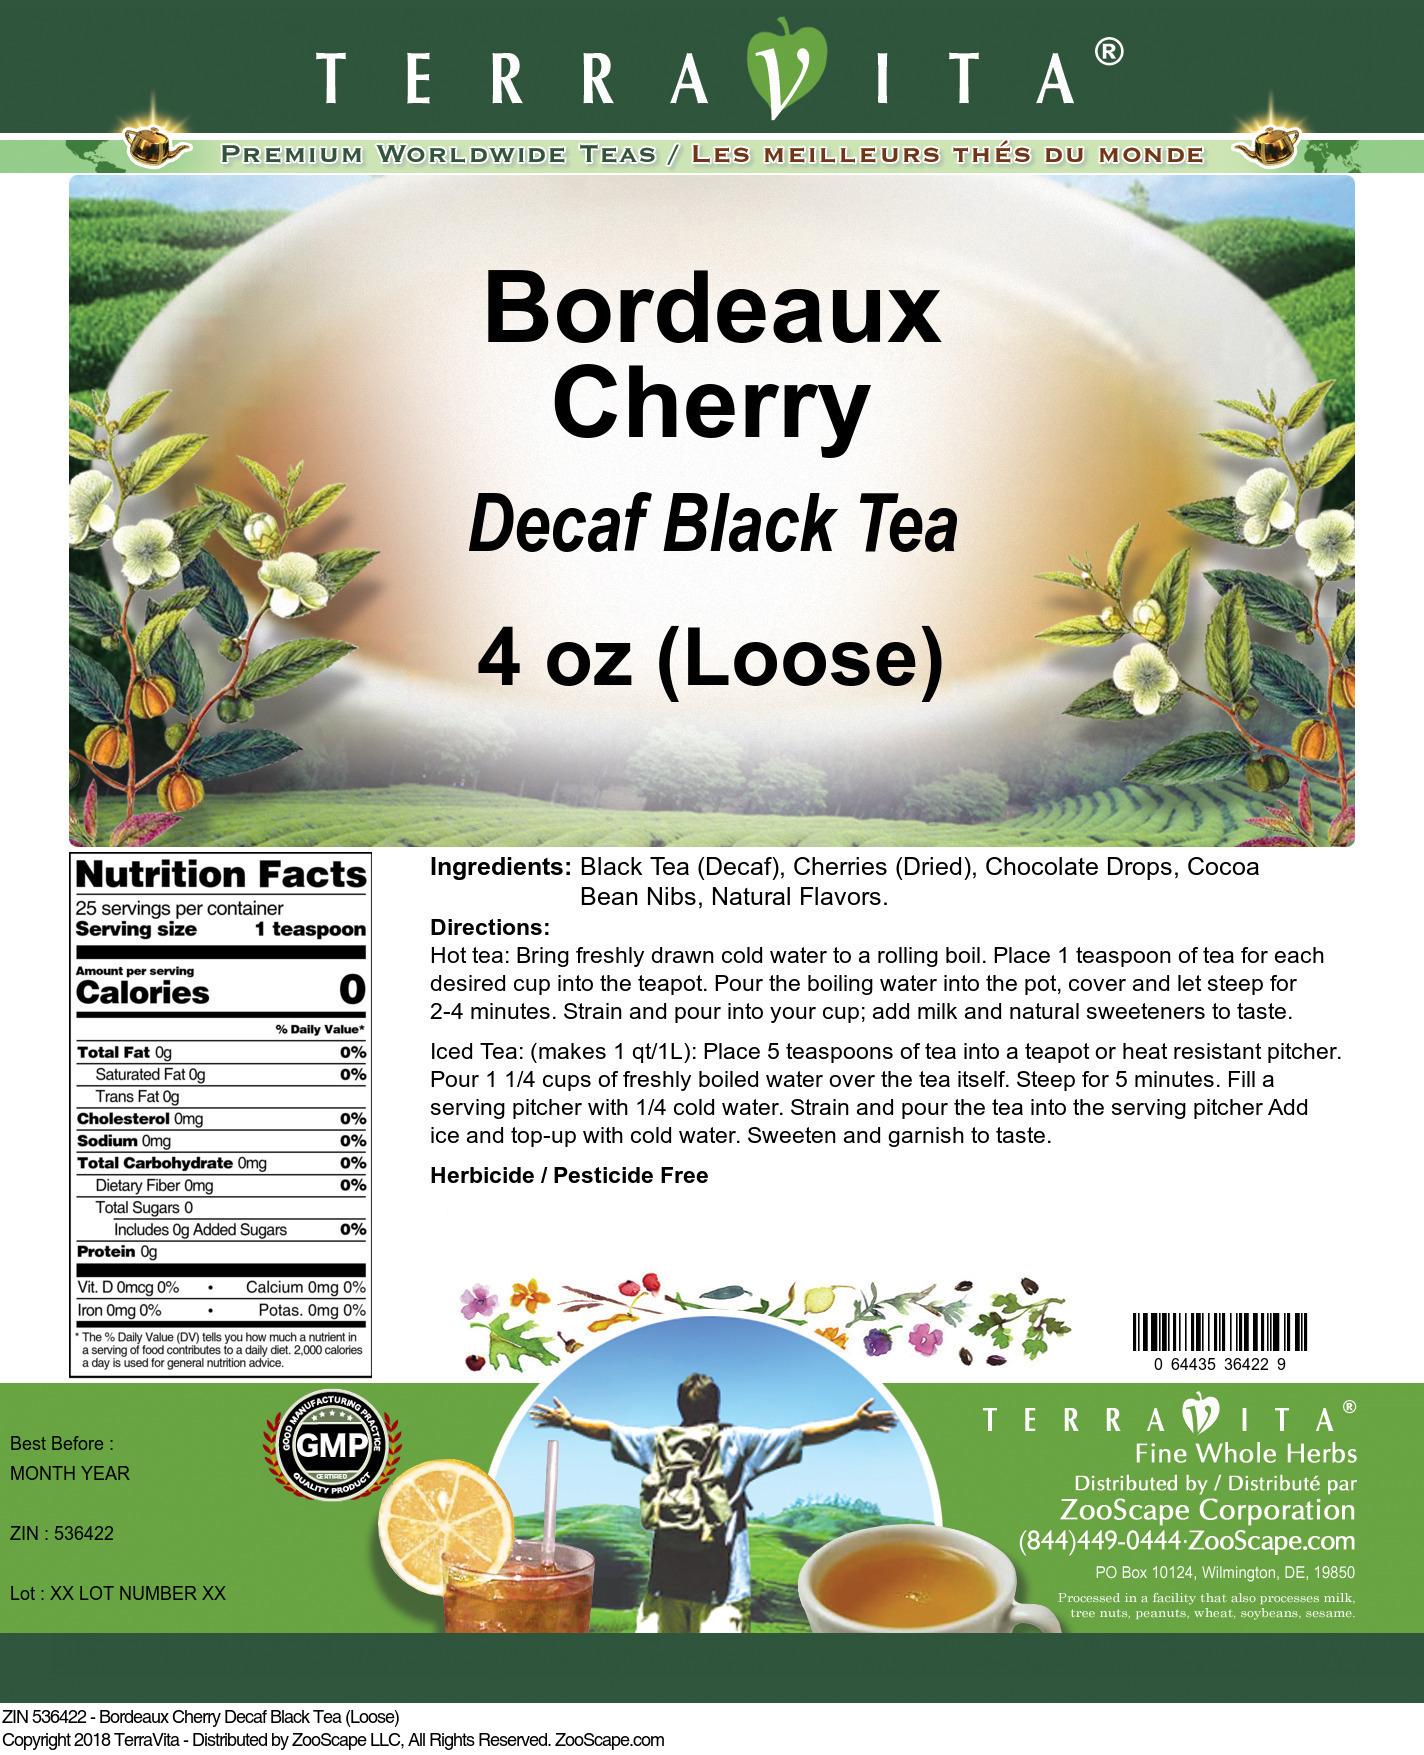 Bordeaux Cherry Decaf Black Tea (Loose)